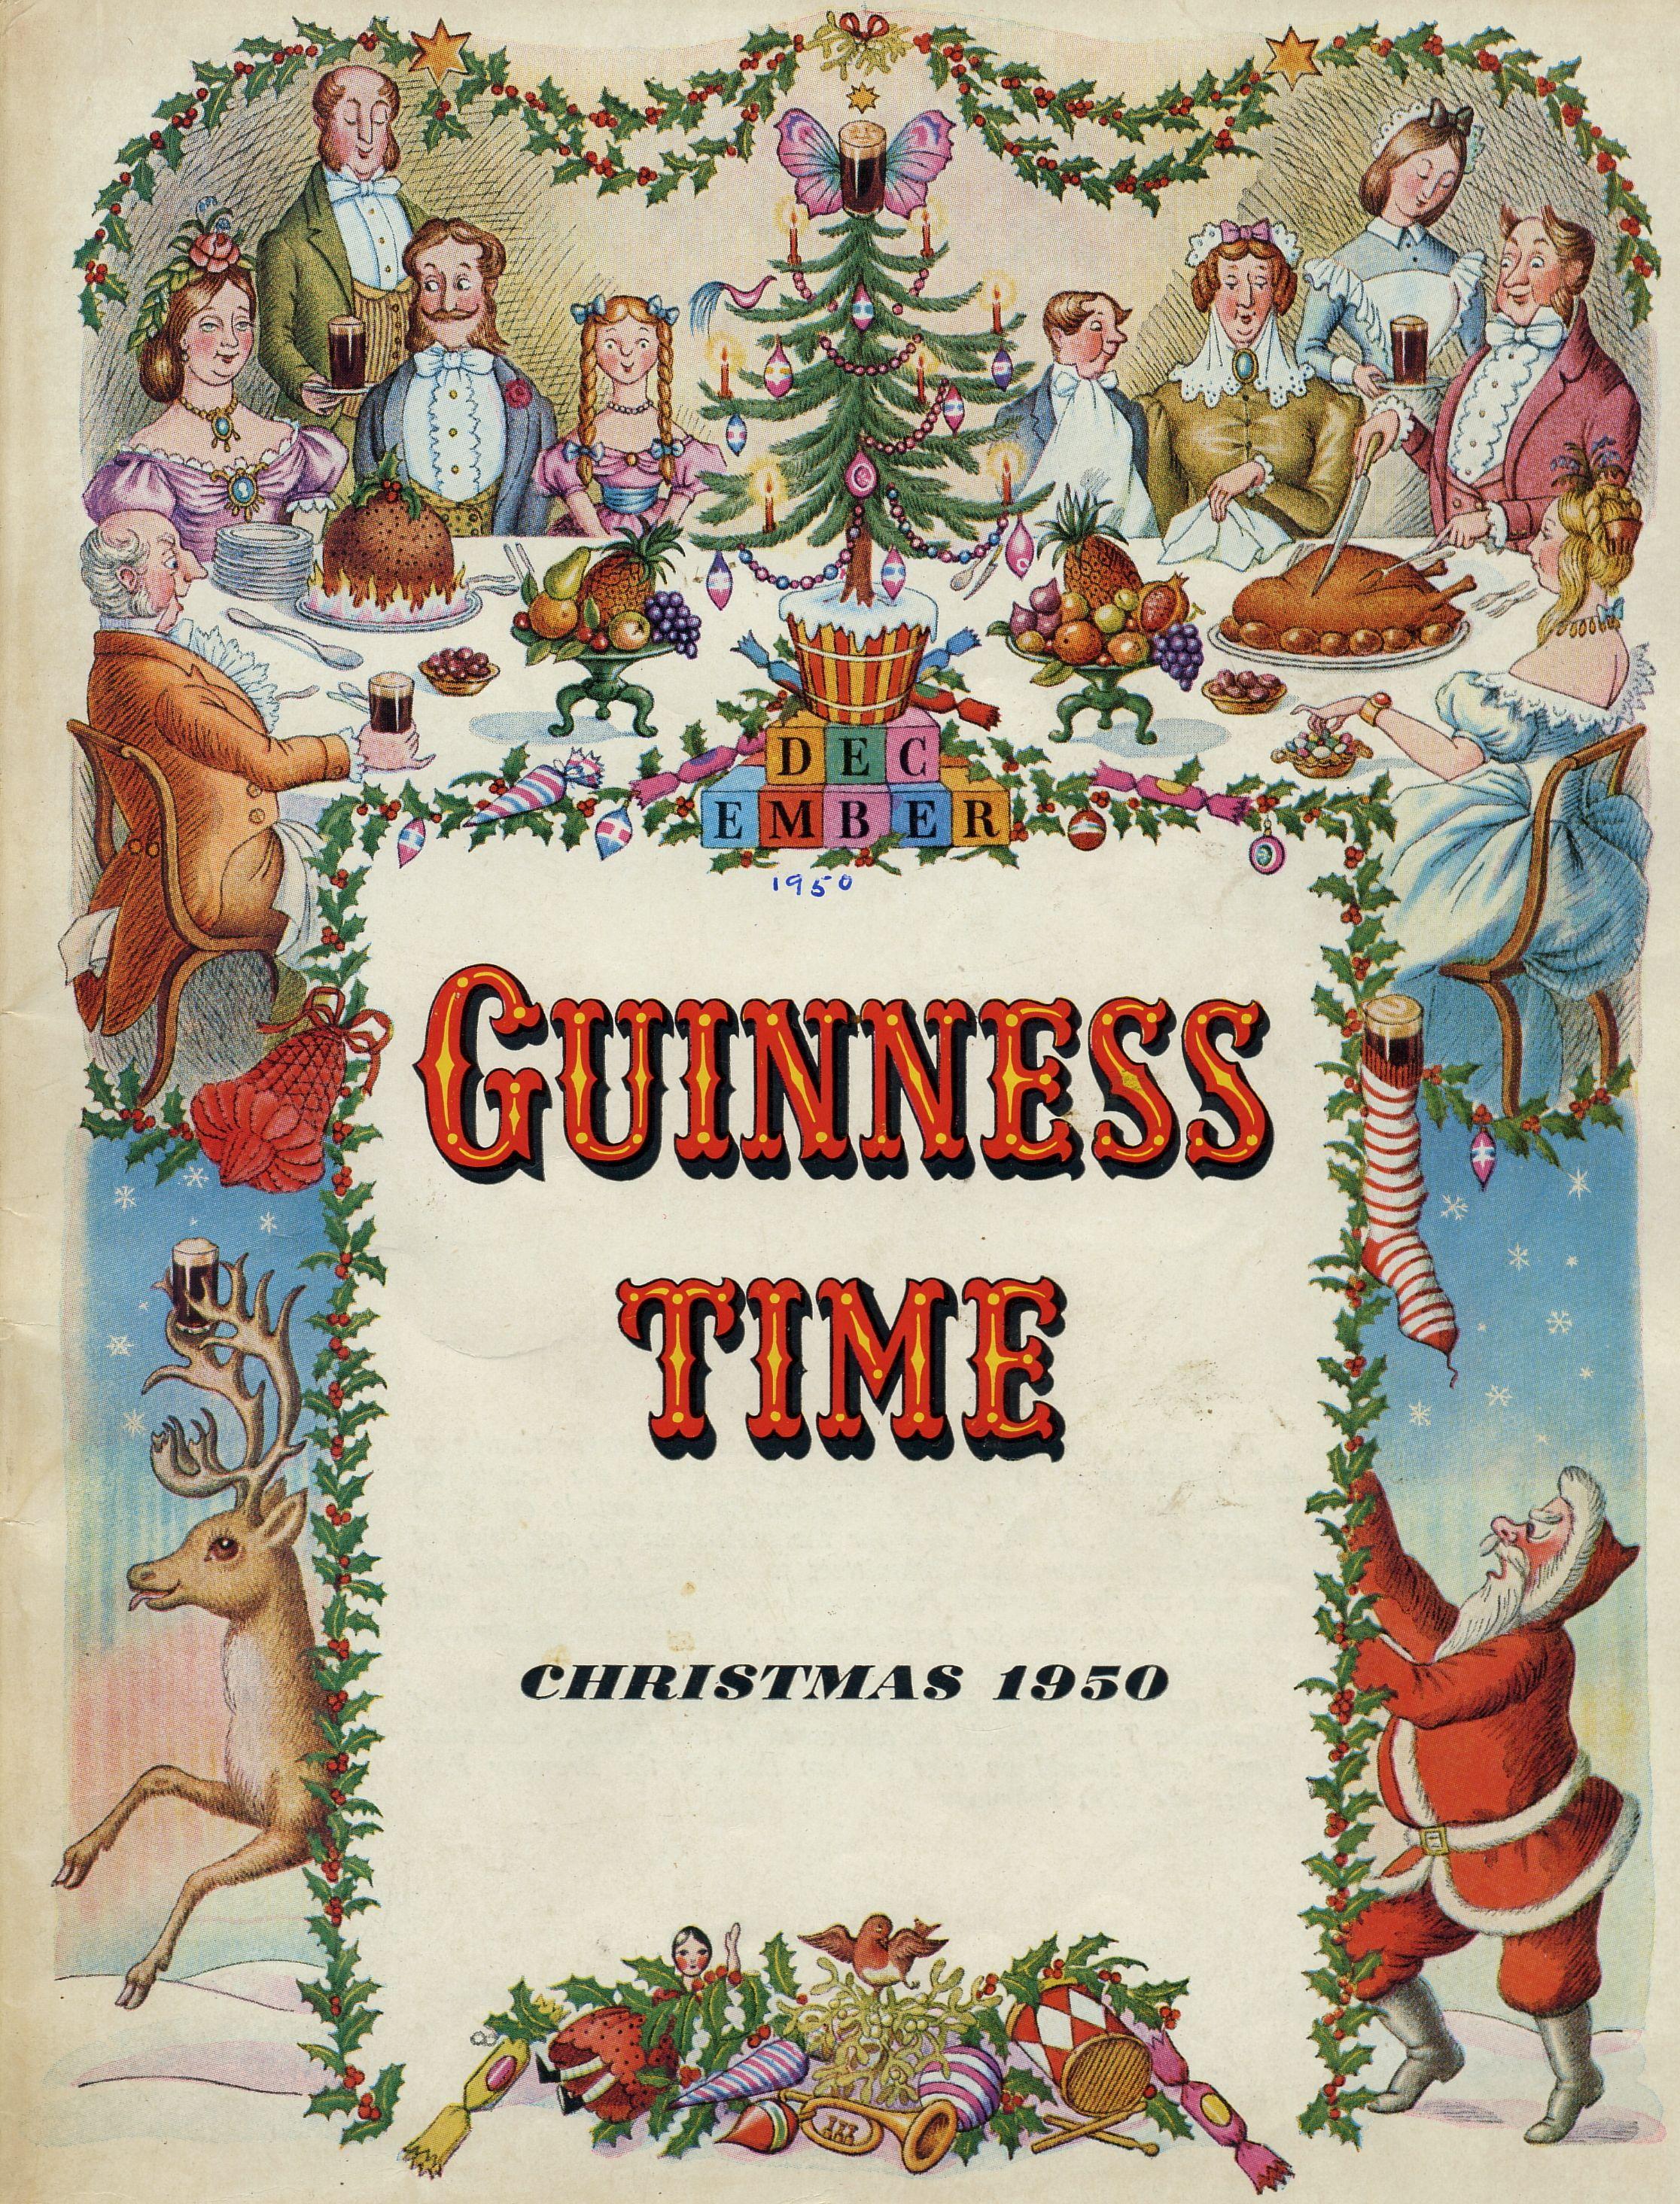 Guinness time christmas 1950